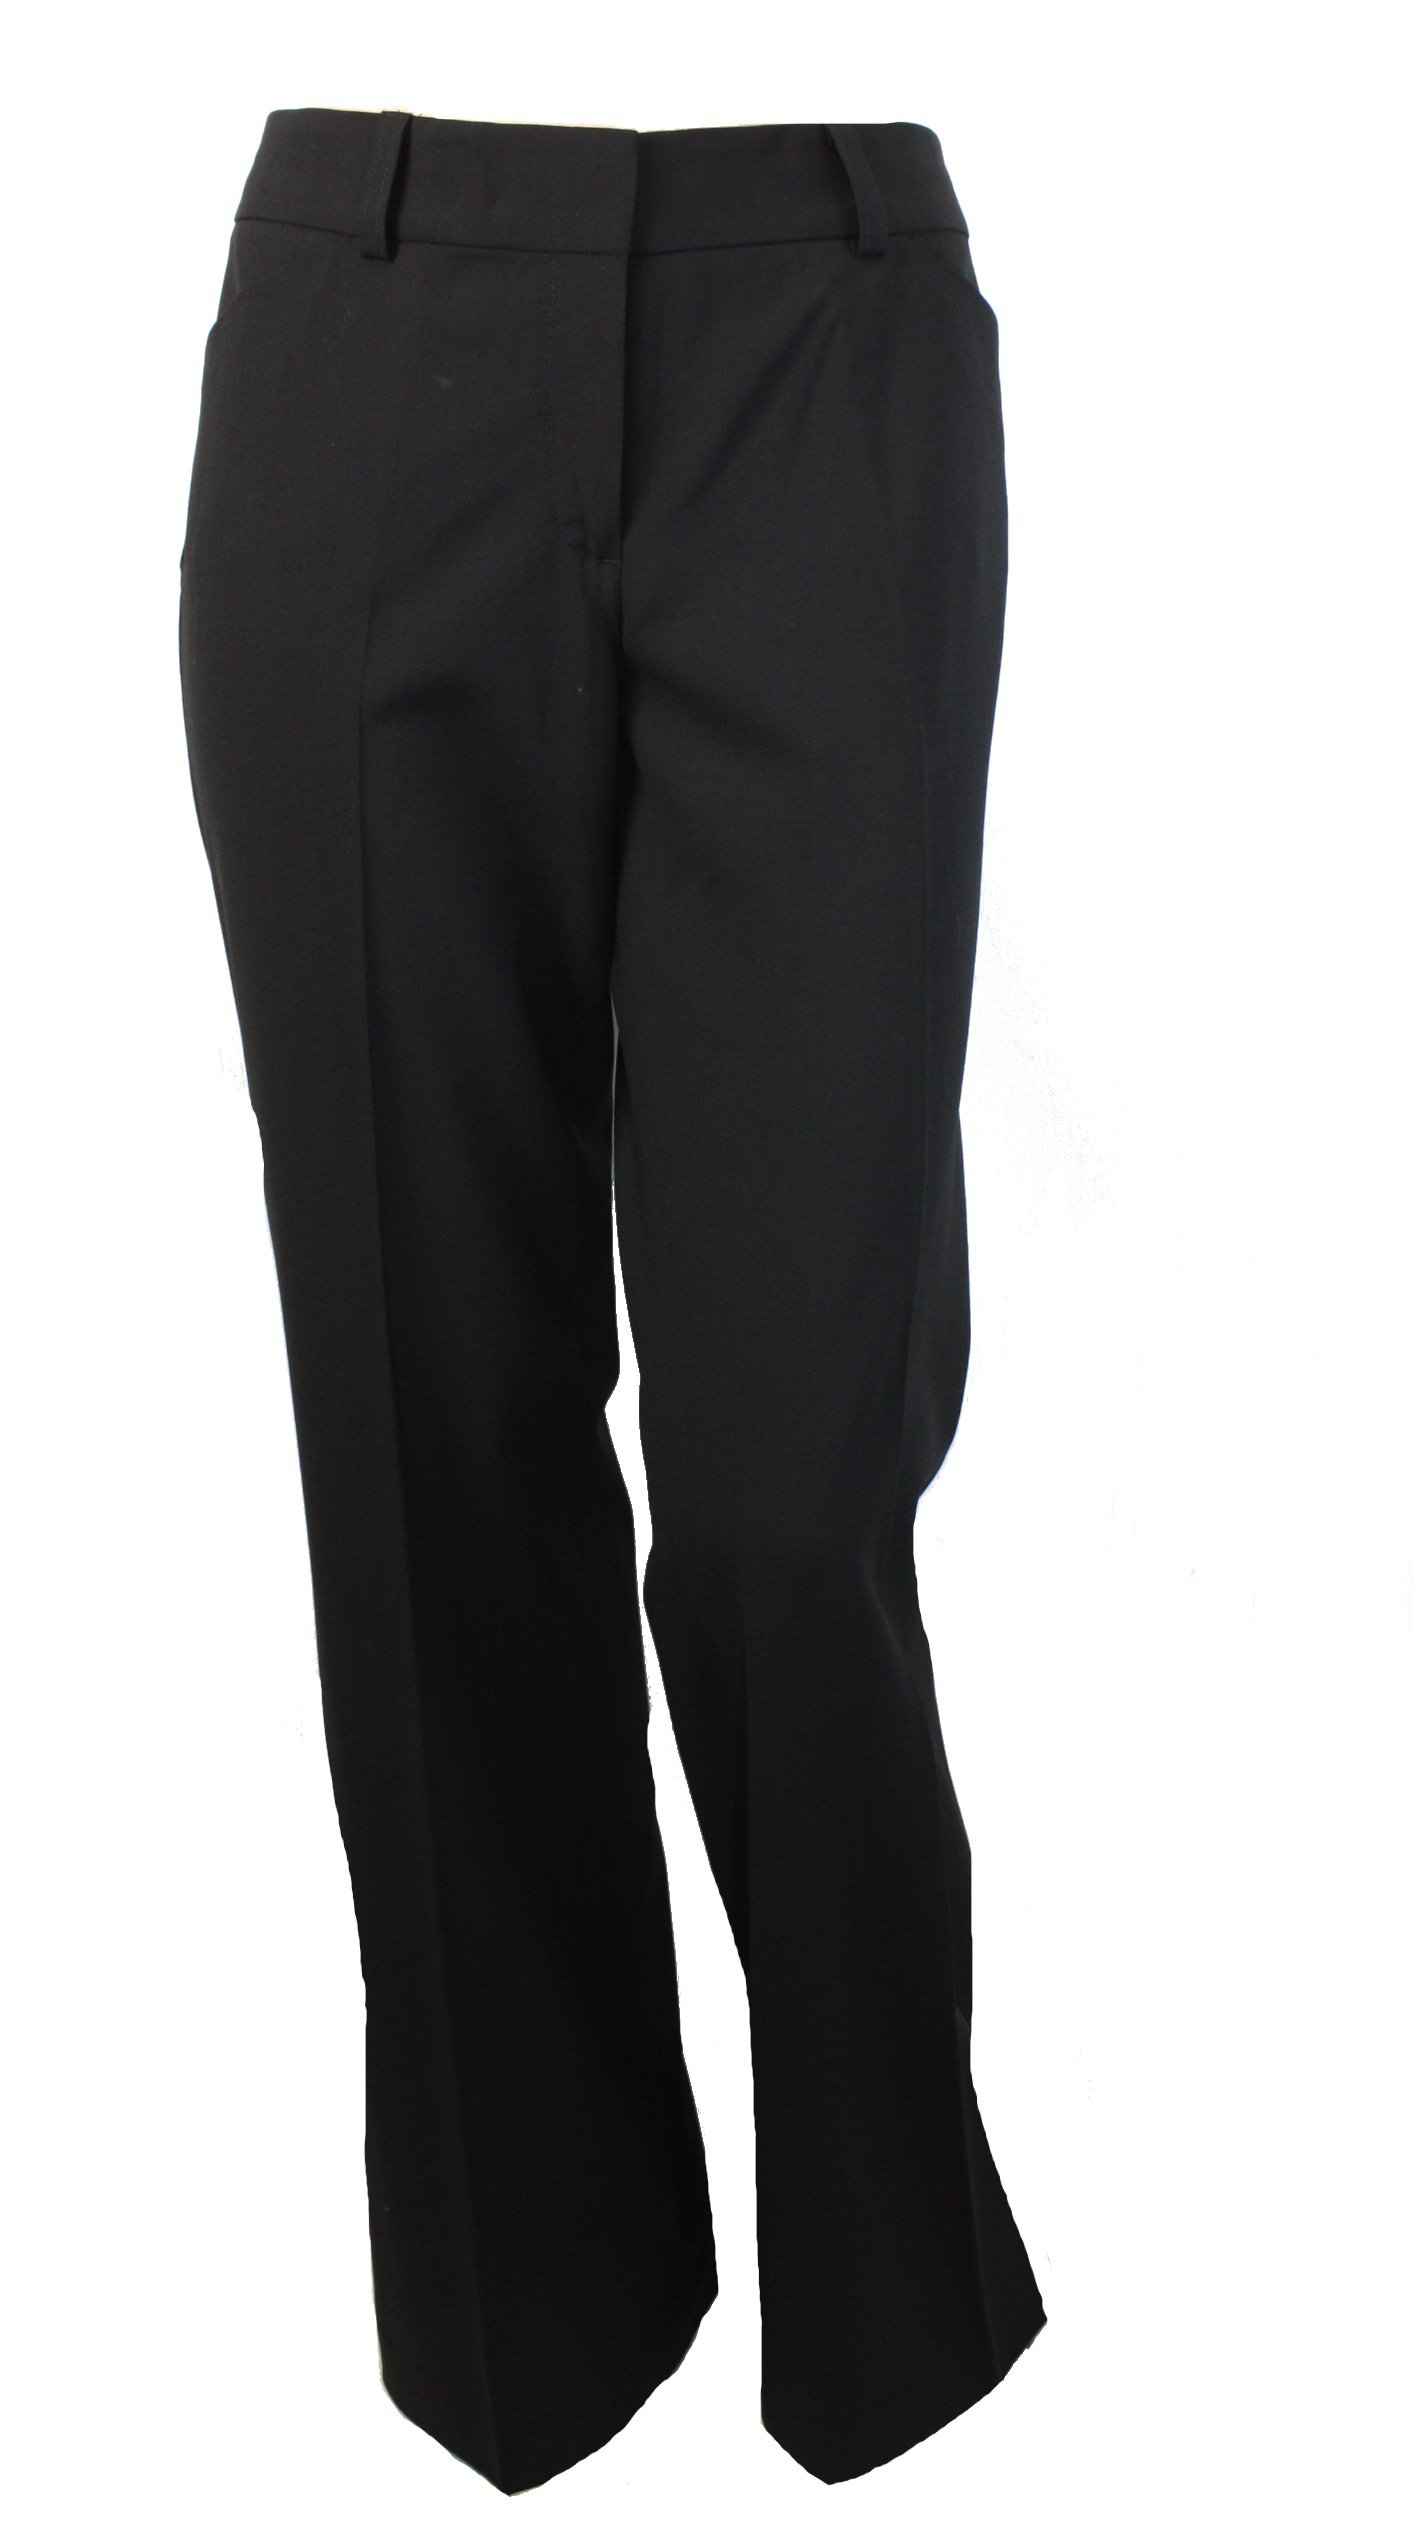 Kirkland Signature Womens Classic Wool Stretch Dress Pants Black 4 Average